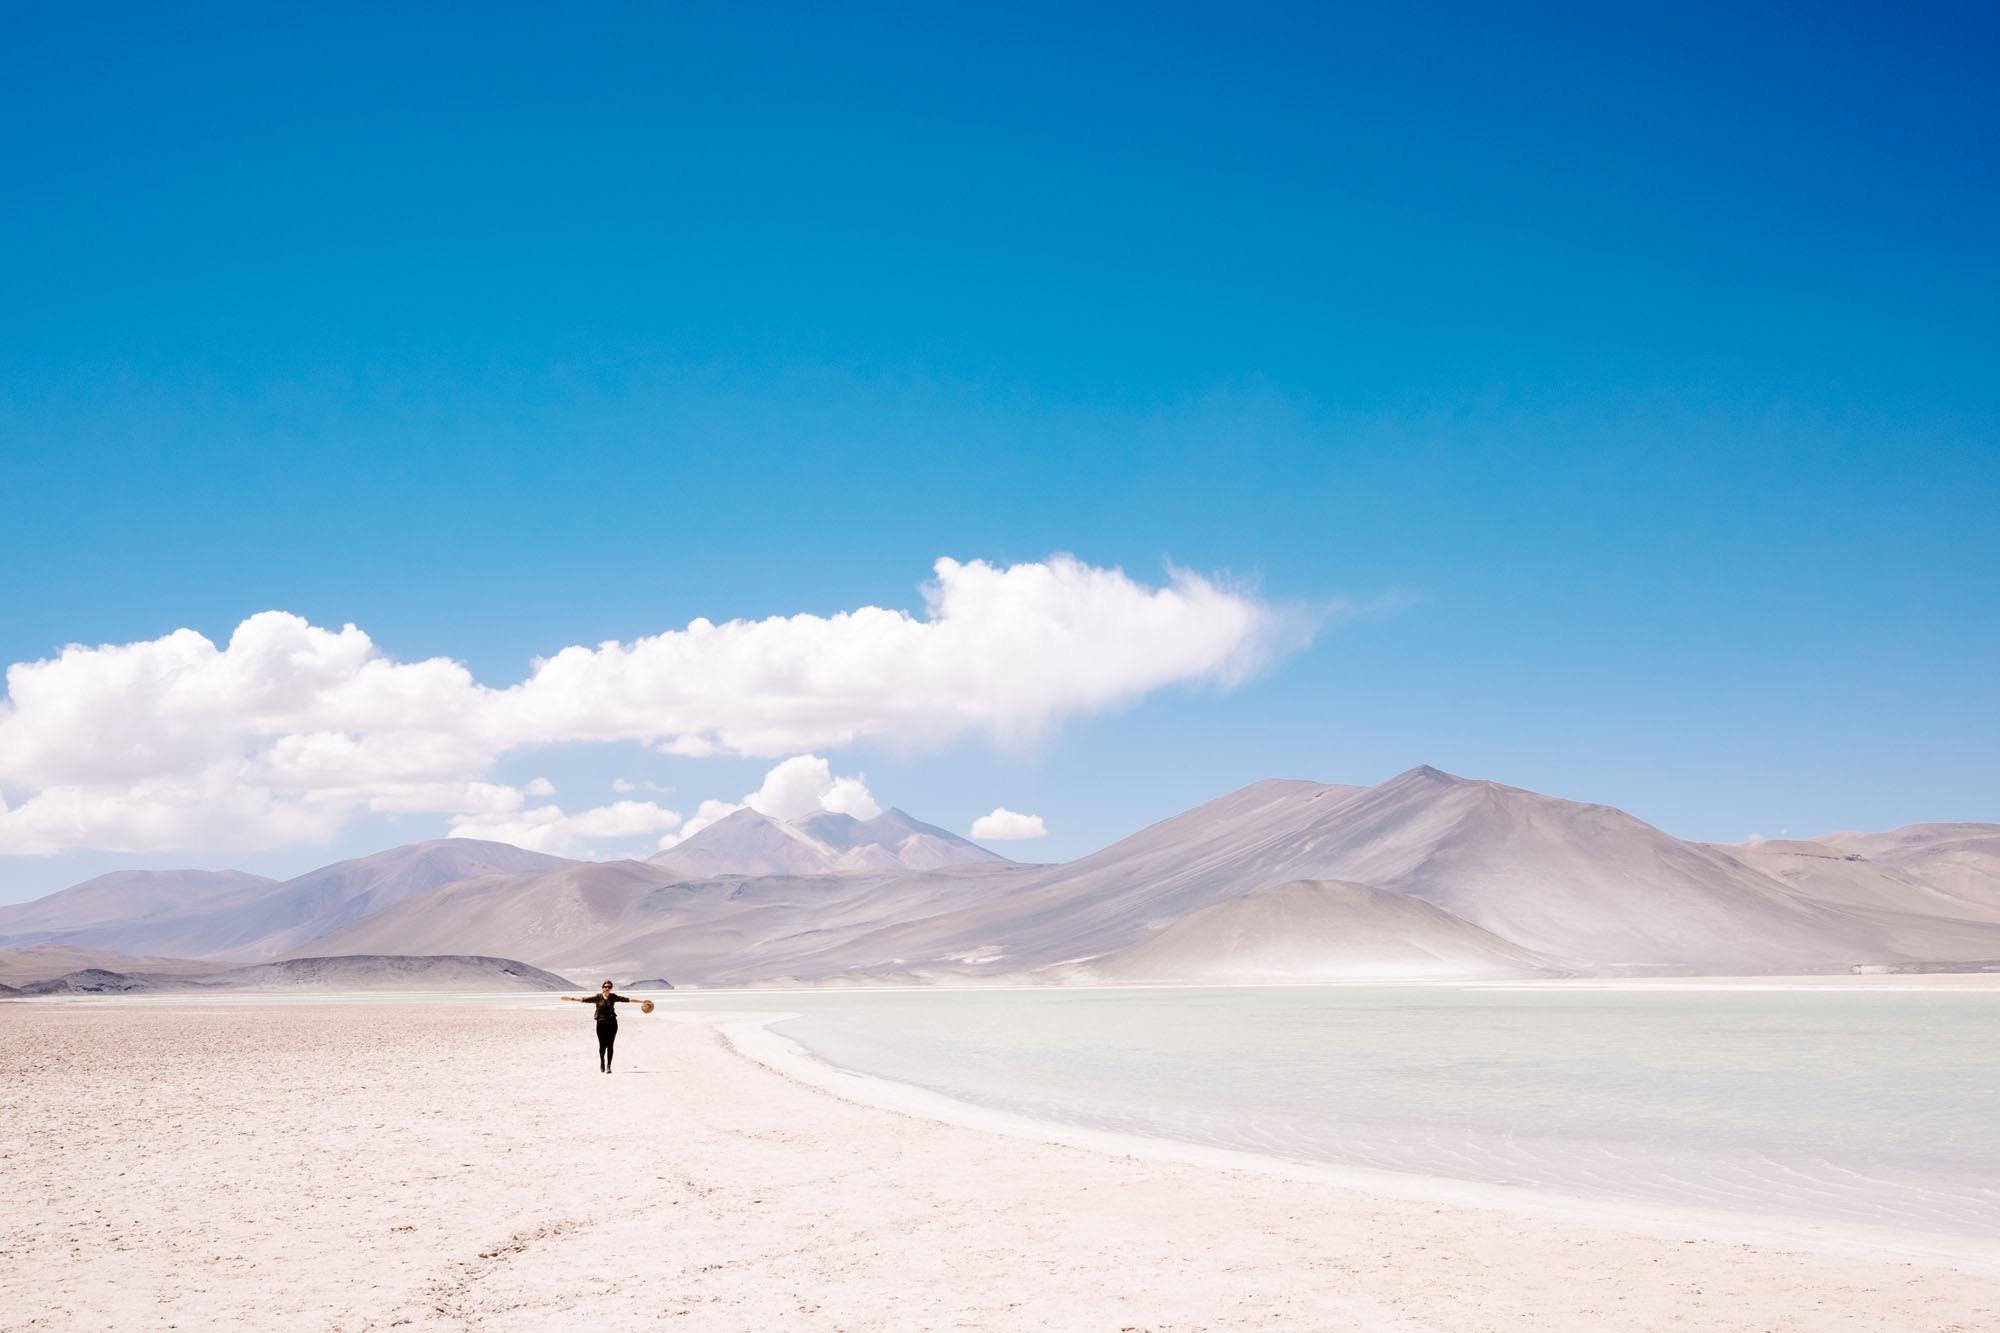 JenniferEmerling_Chile_AtacamaDesert03.jpg